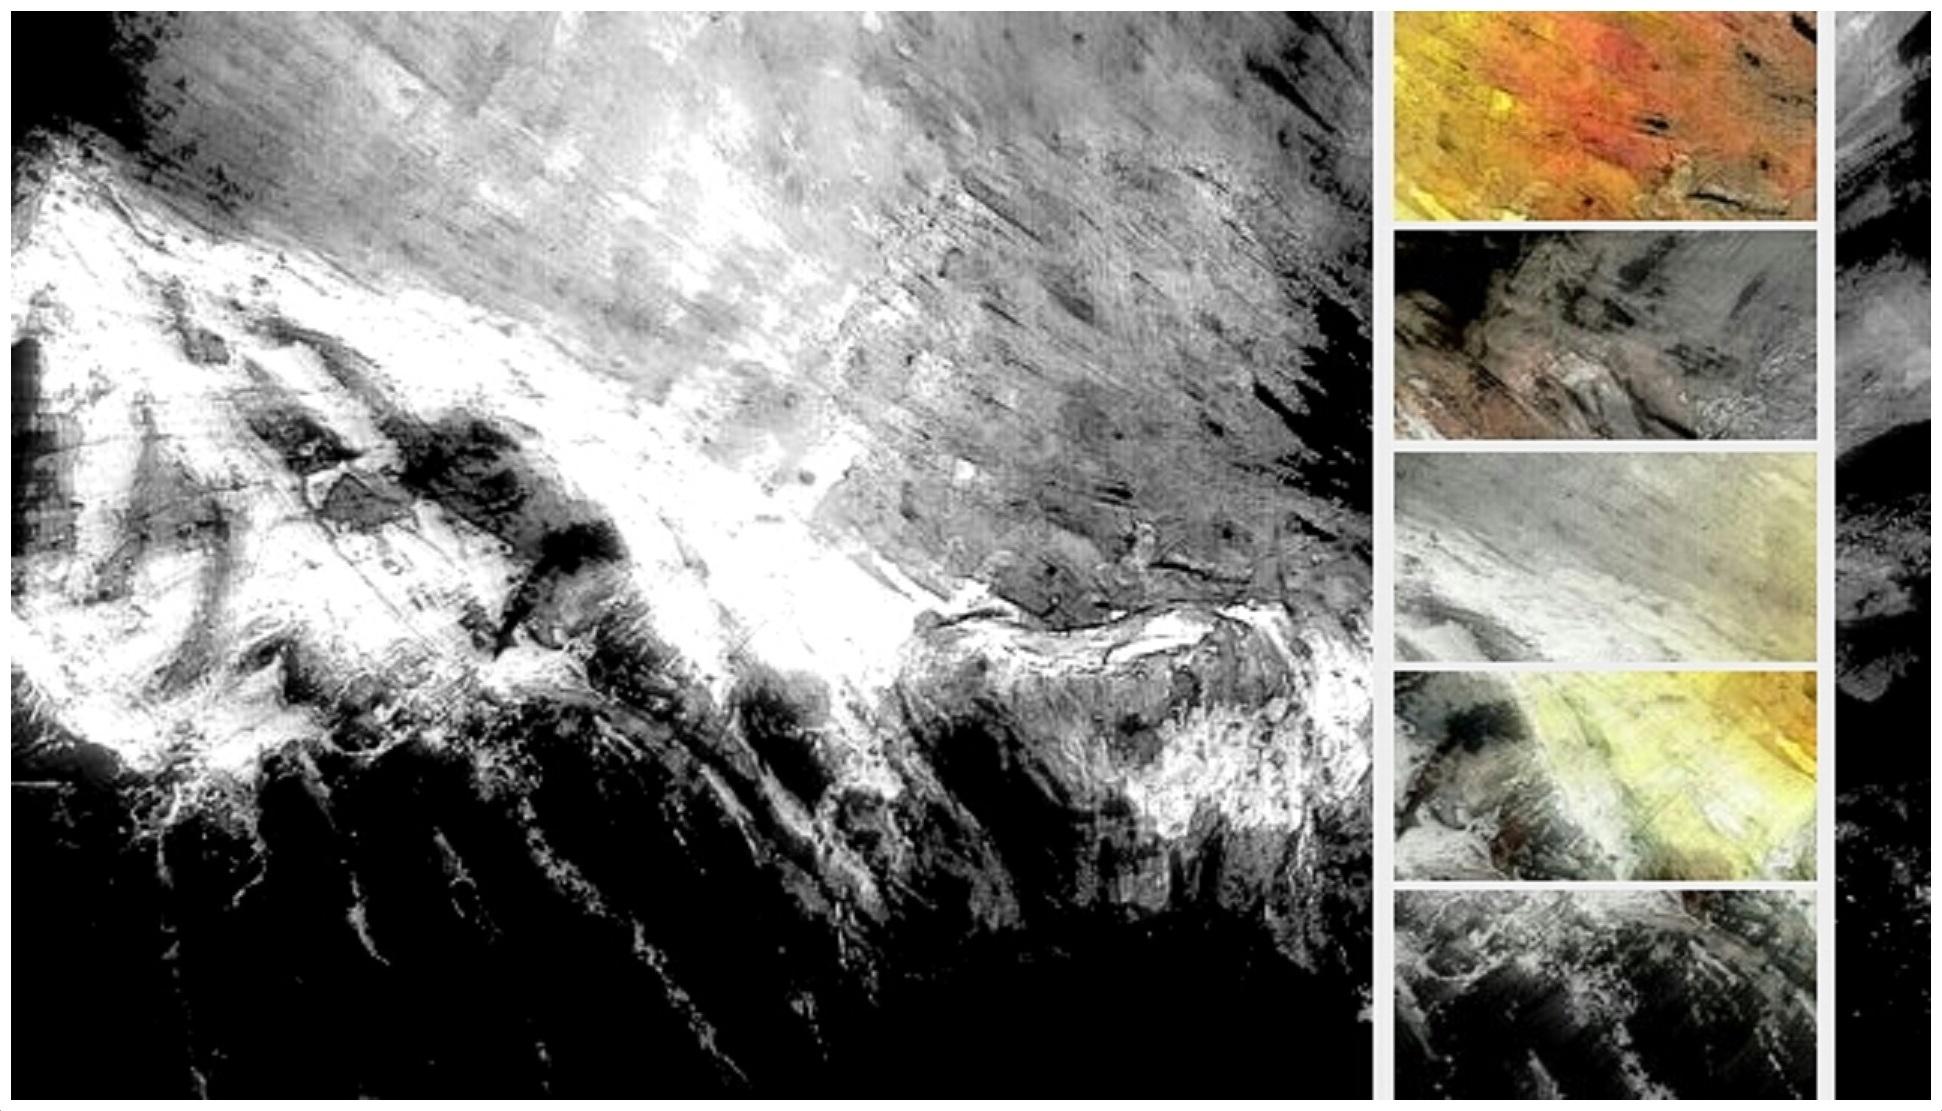 Flug 4U 9525 - digital Remix des Reliefbildes FIRE IN THE MOUNTAIN